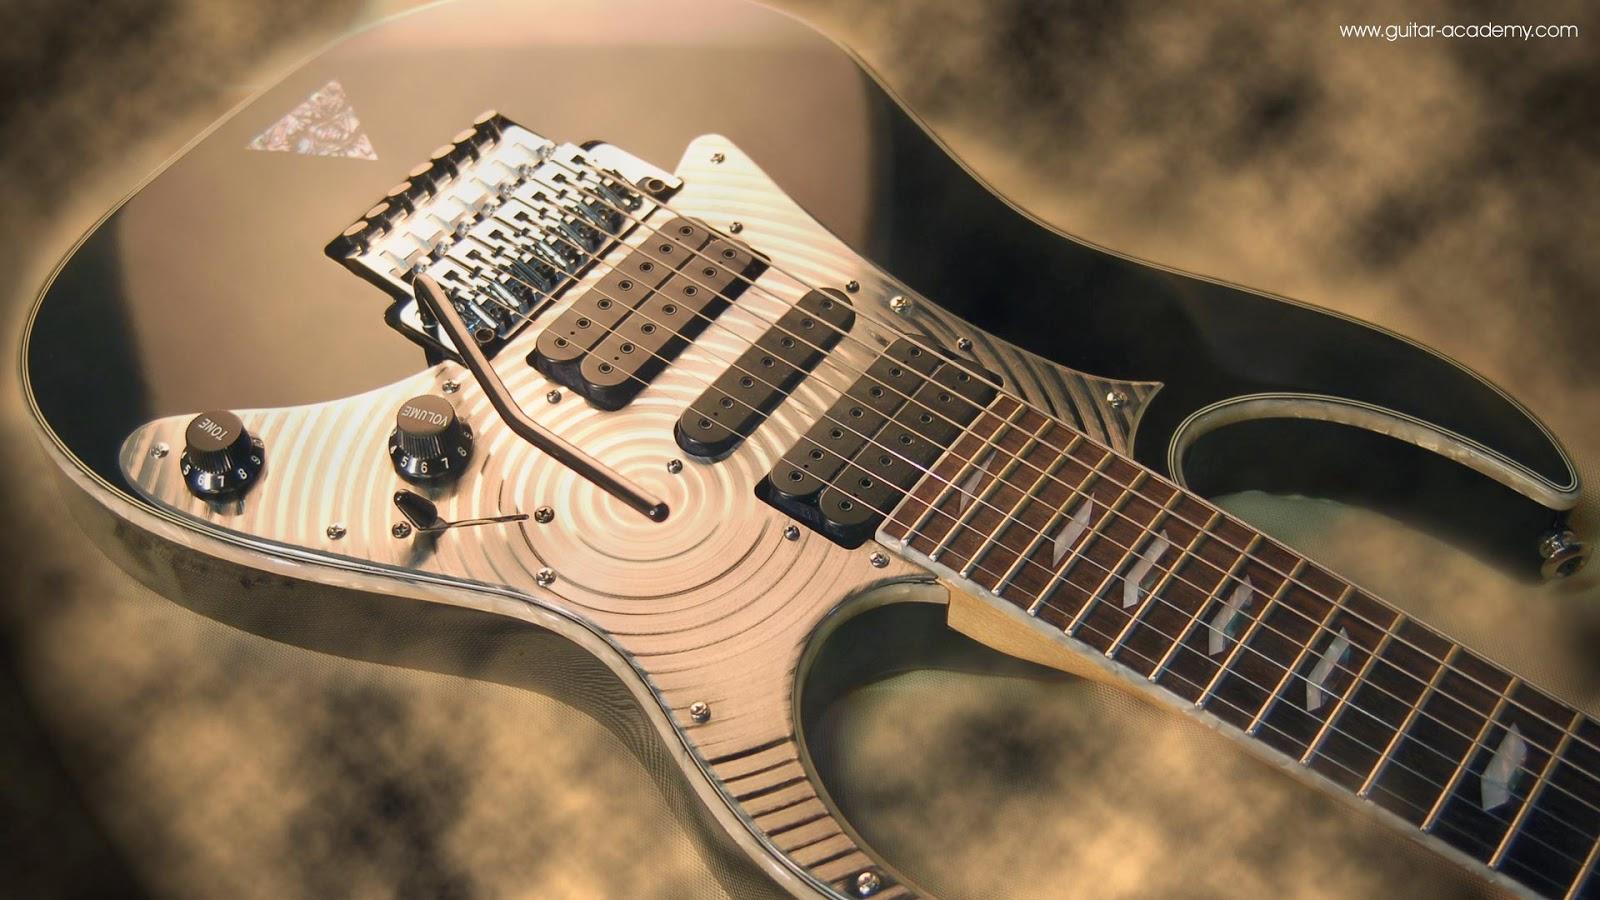 Acoustic Guitar Wallpapers Mobile Wickedsa Guitar Ibanez Guitar 1600x900 Wallpaper Teahub Io